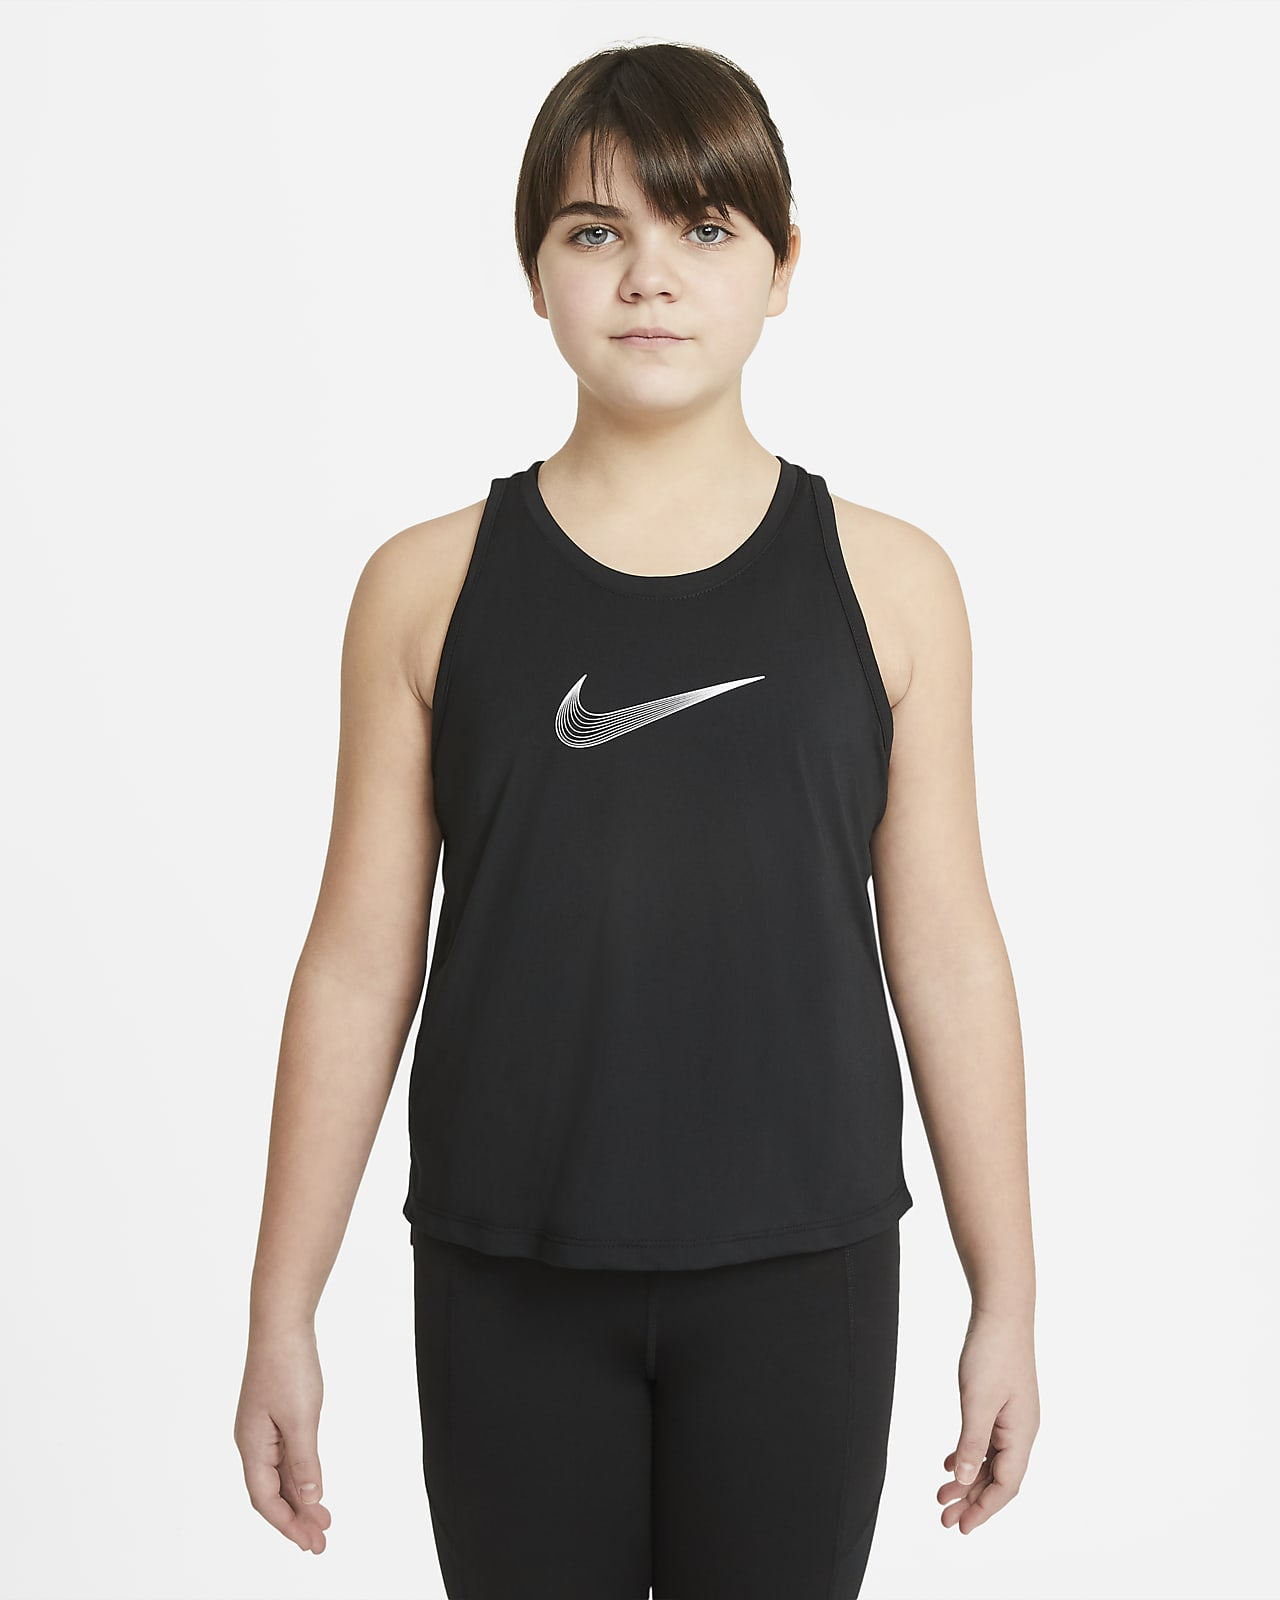 Nike Dri-FIT Trophy Trainings-Tanktop für ältere Kinder (Mädchen) (große Größe)